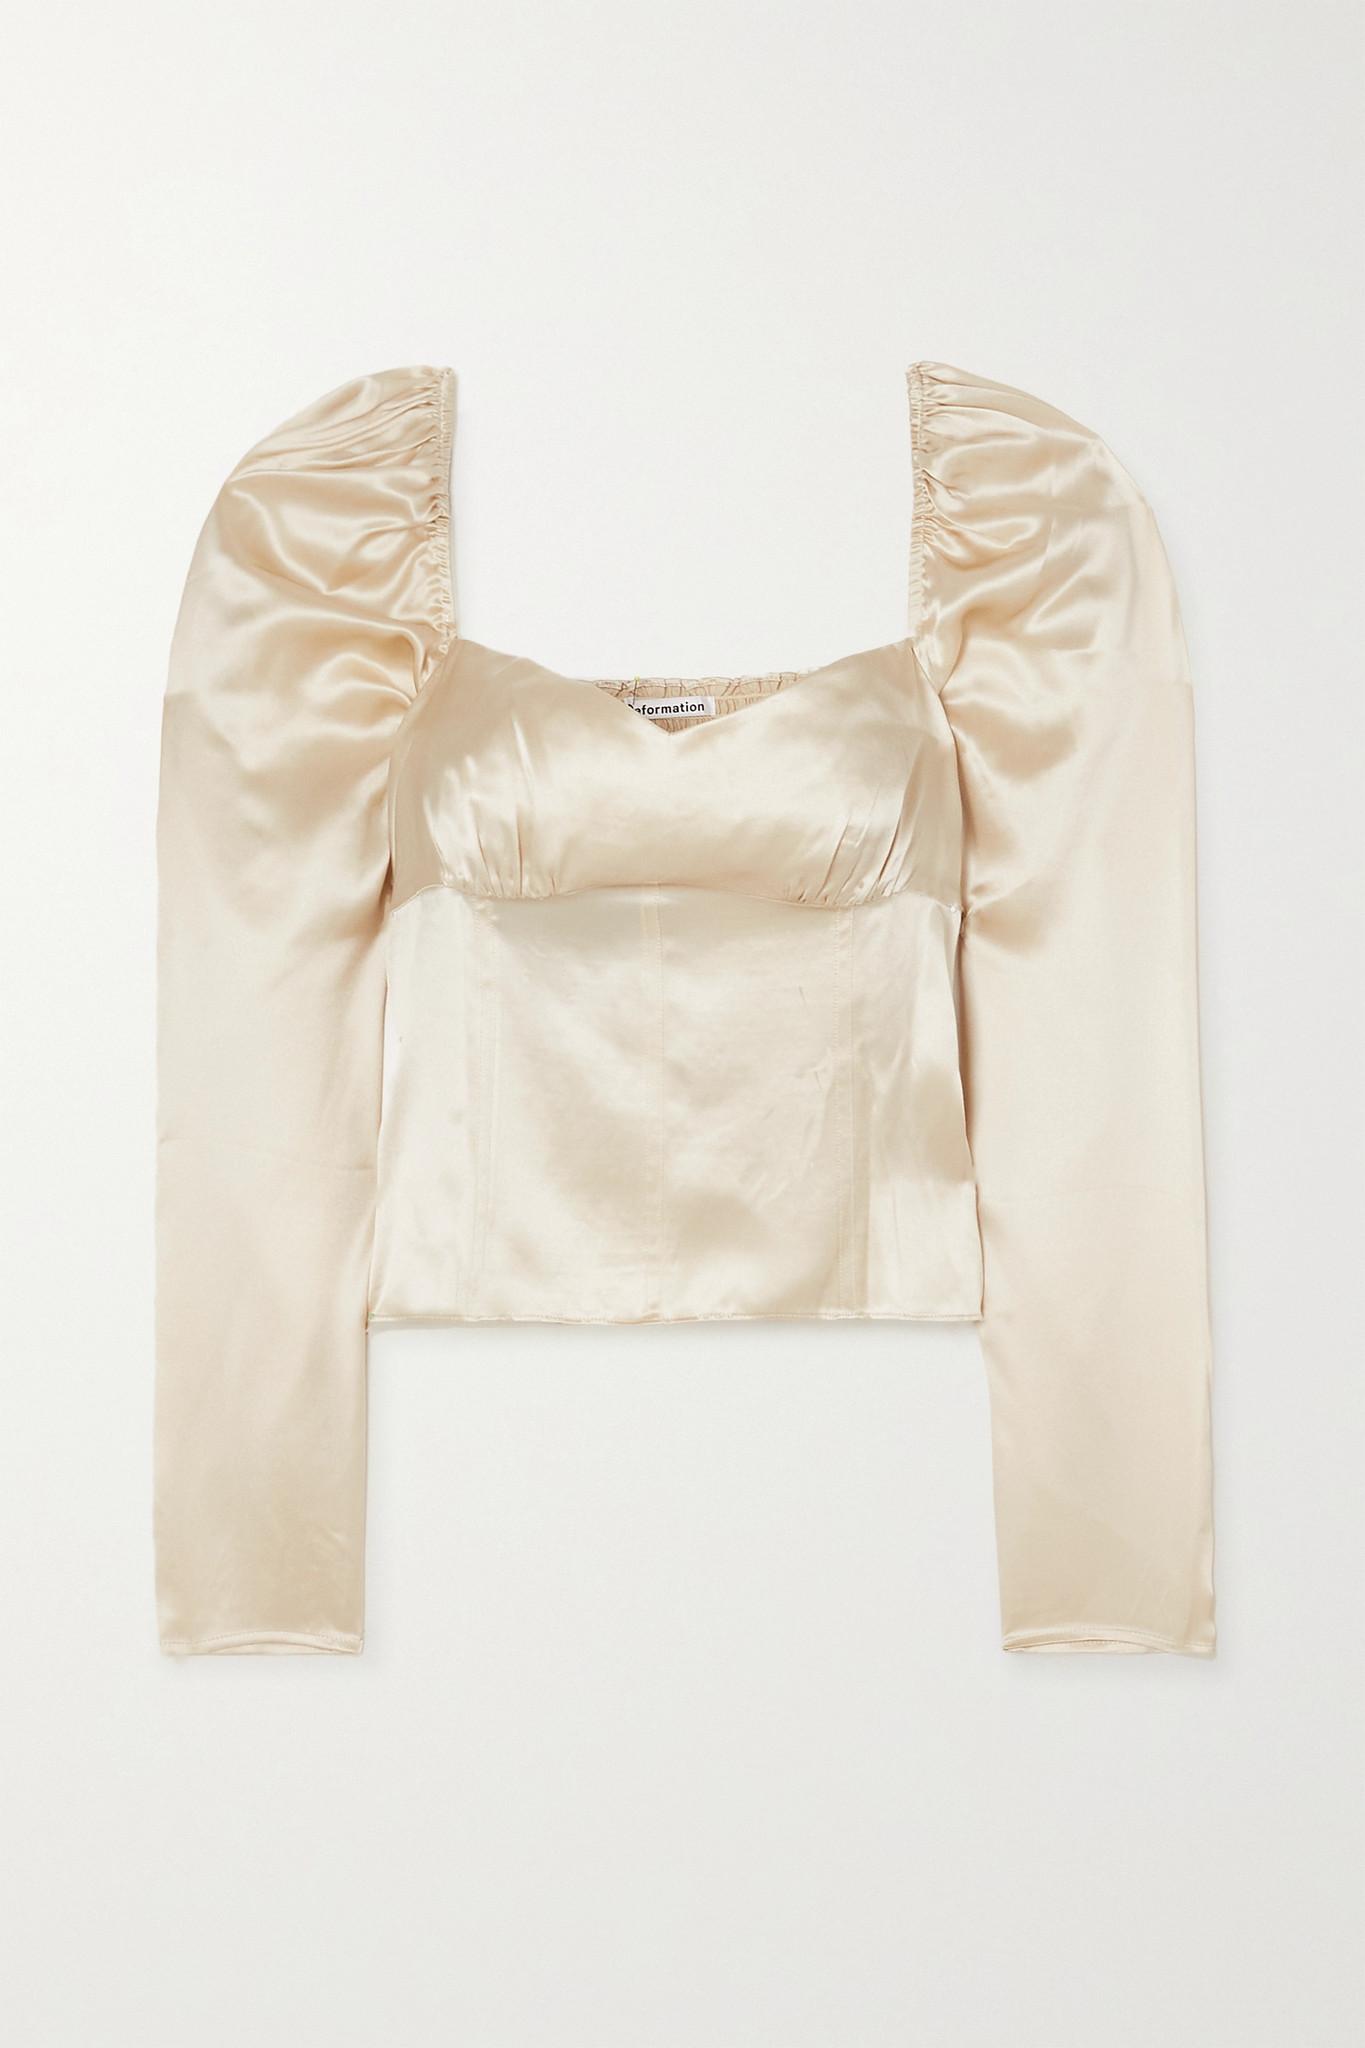 REFORMATION - Roe 平行绉缝丝缎上衣 - 象牙色 - US6